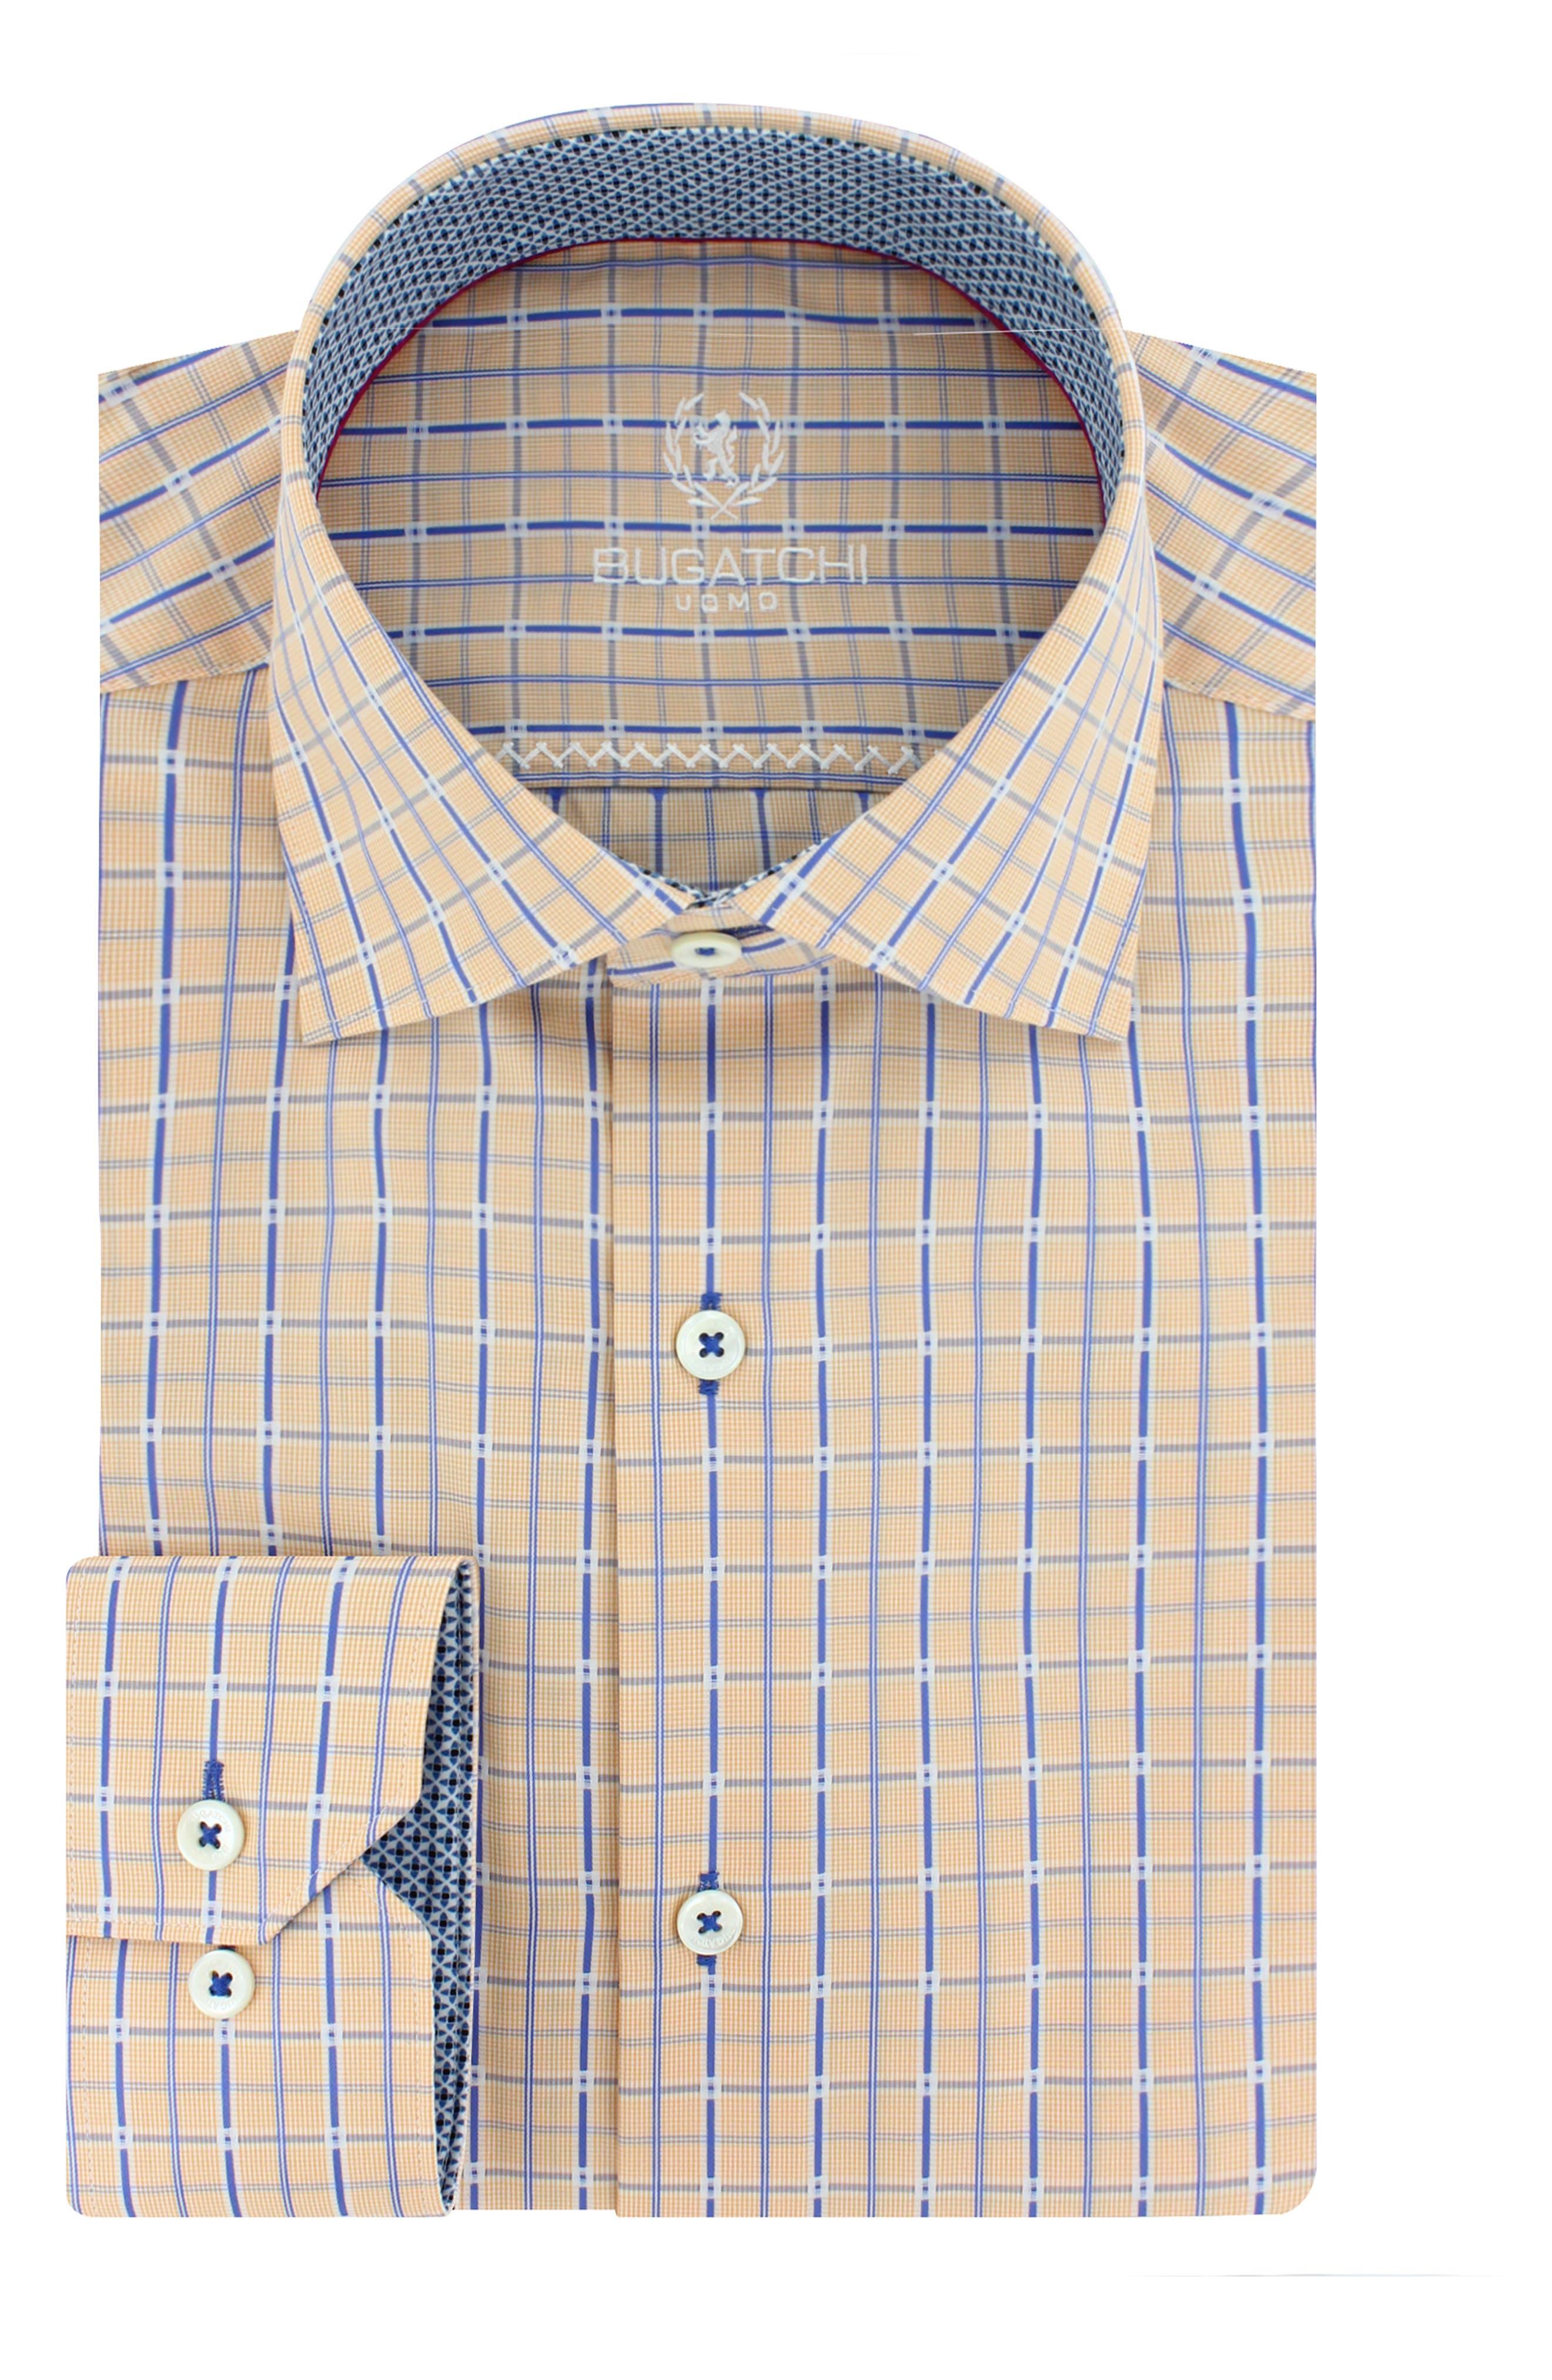 Main Image - Bugatchi Trim Fit Grid Check Dress Shirt